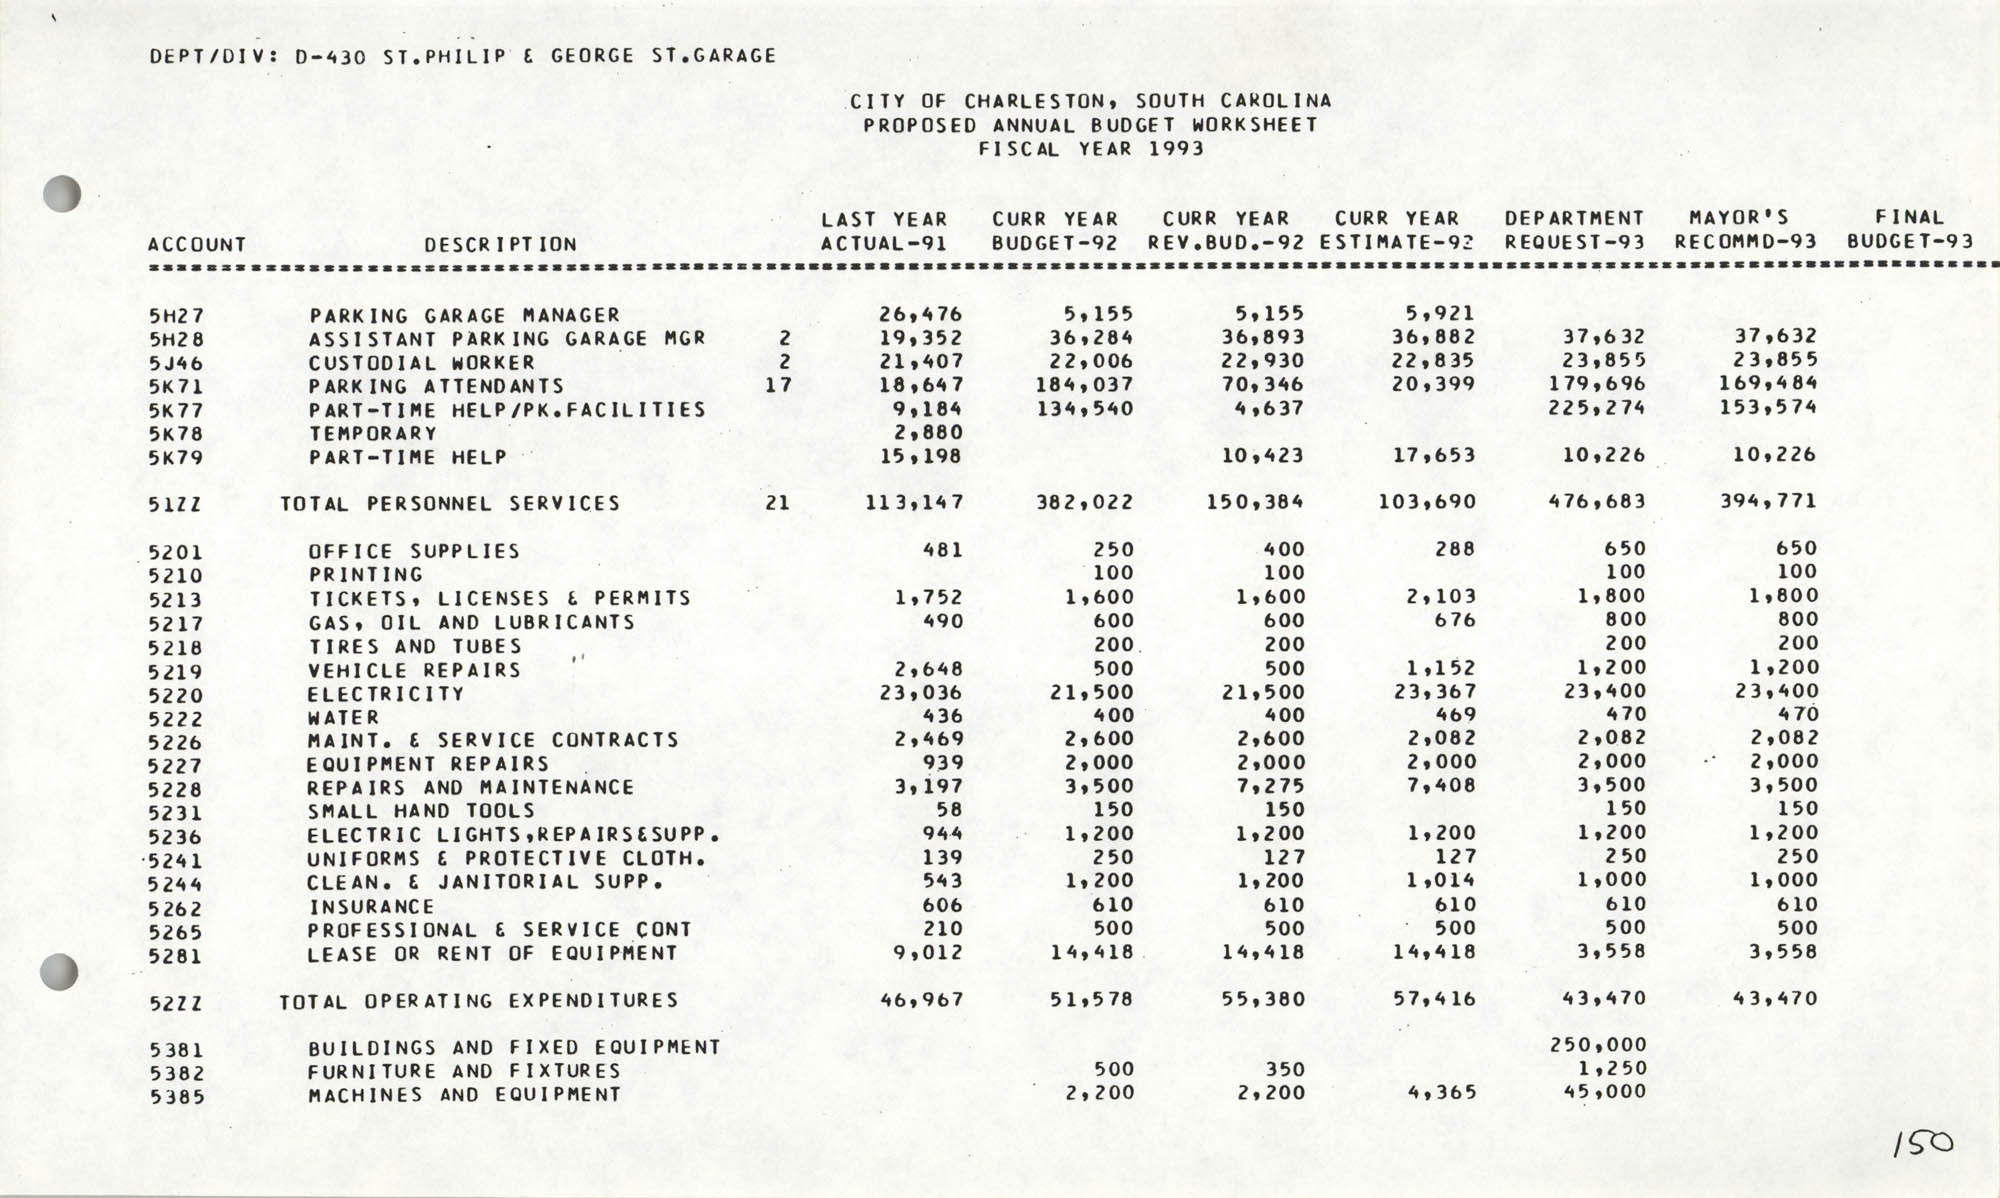 The City Council of Charleston, South Carolina, 1993 Budget, Page 150